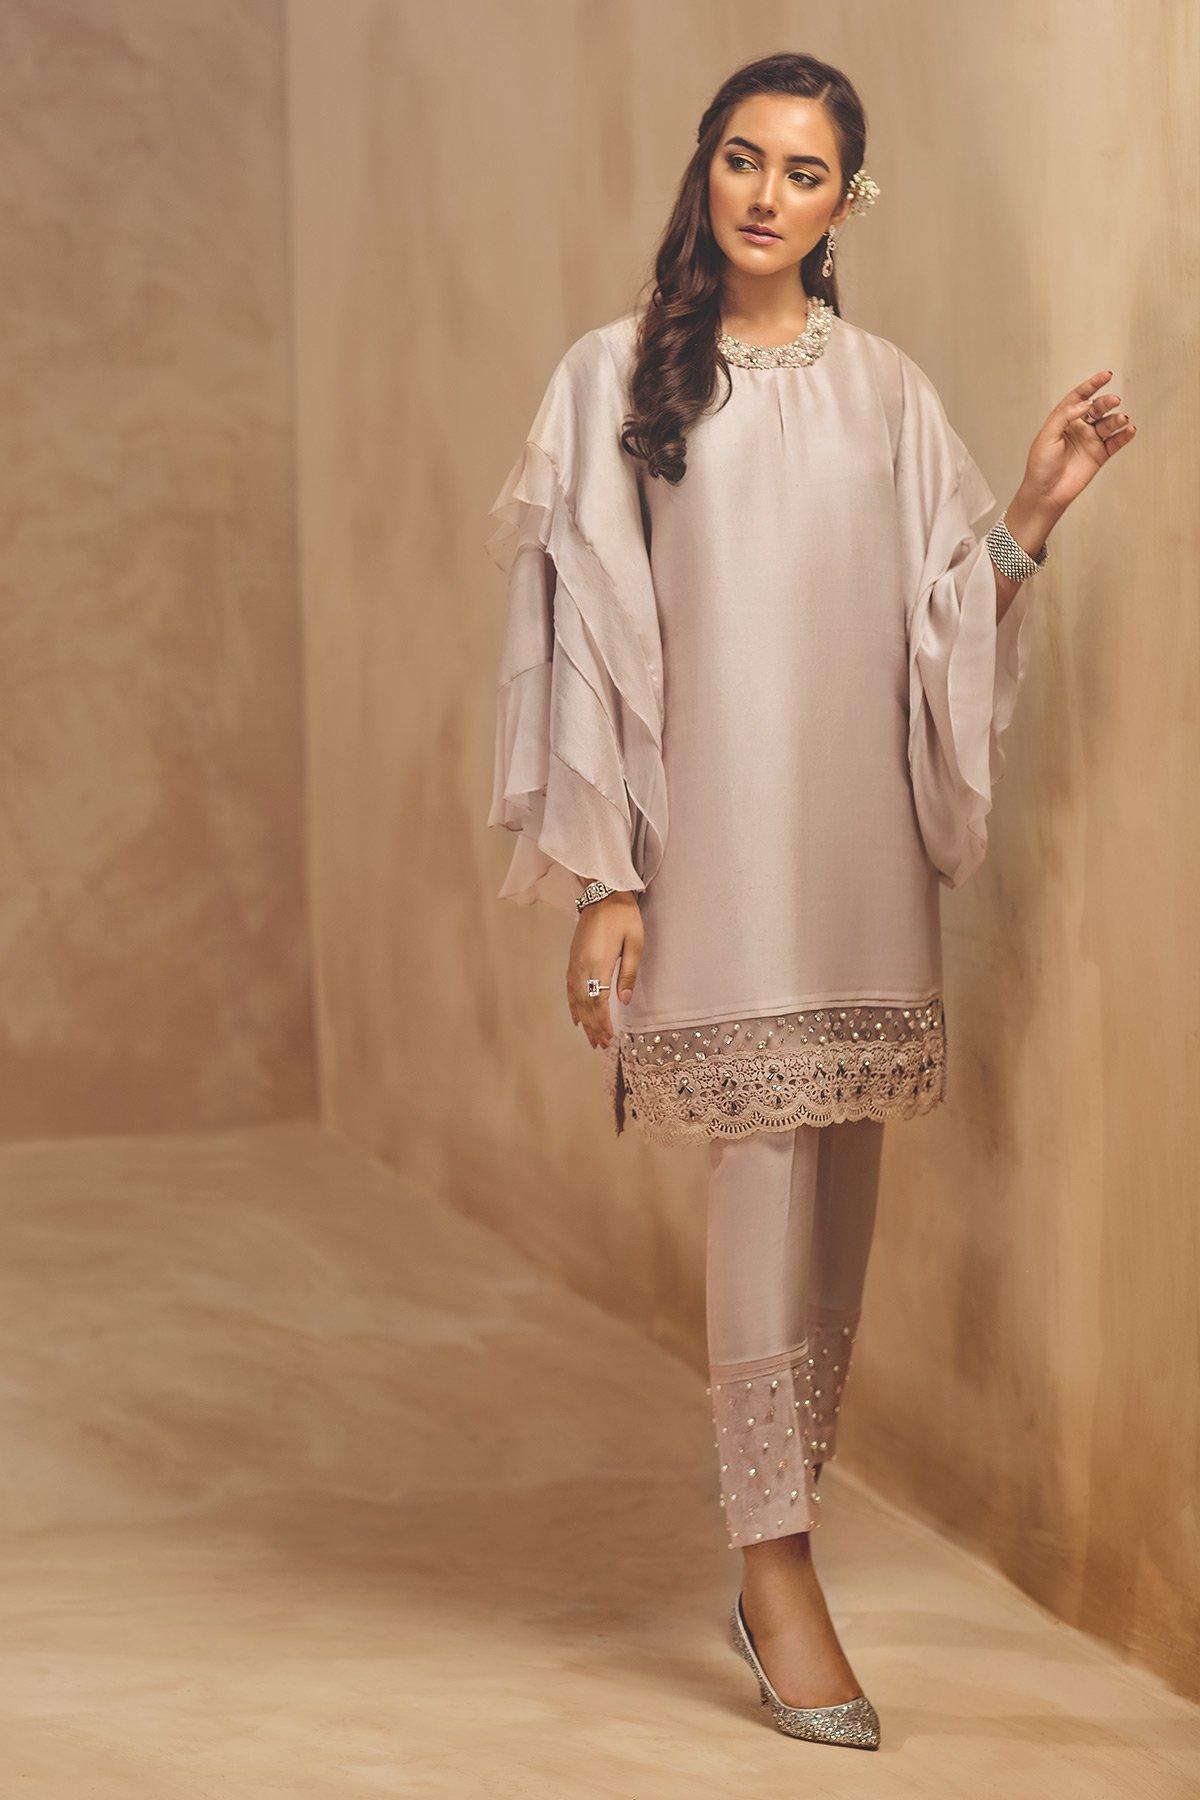 /2019/05/ammara-khan-eid-collection-19-rtw-sf-1955-p-image2.jpeg